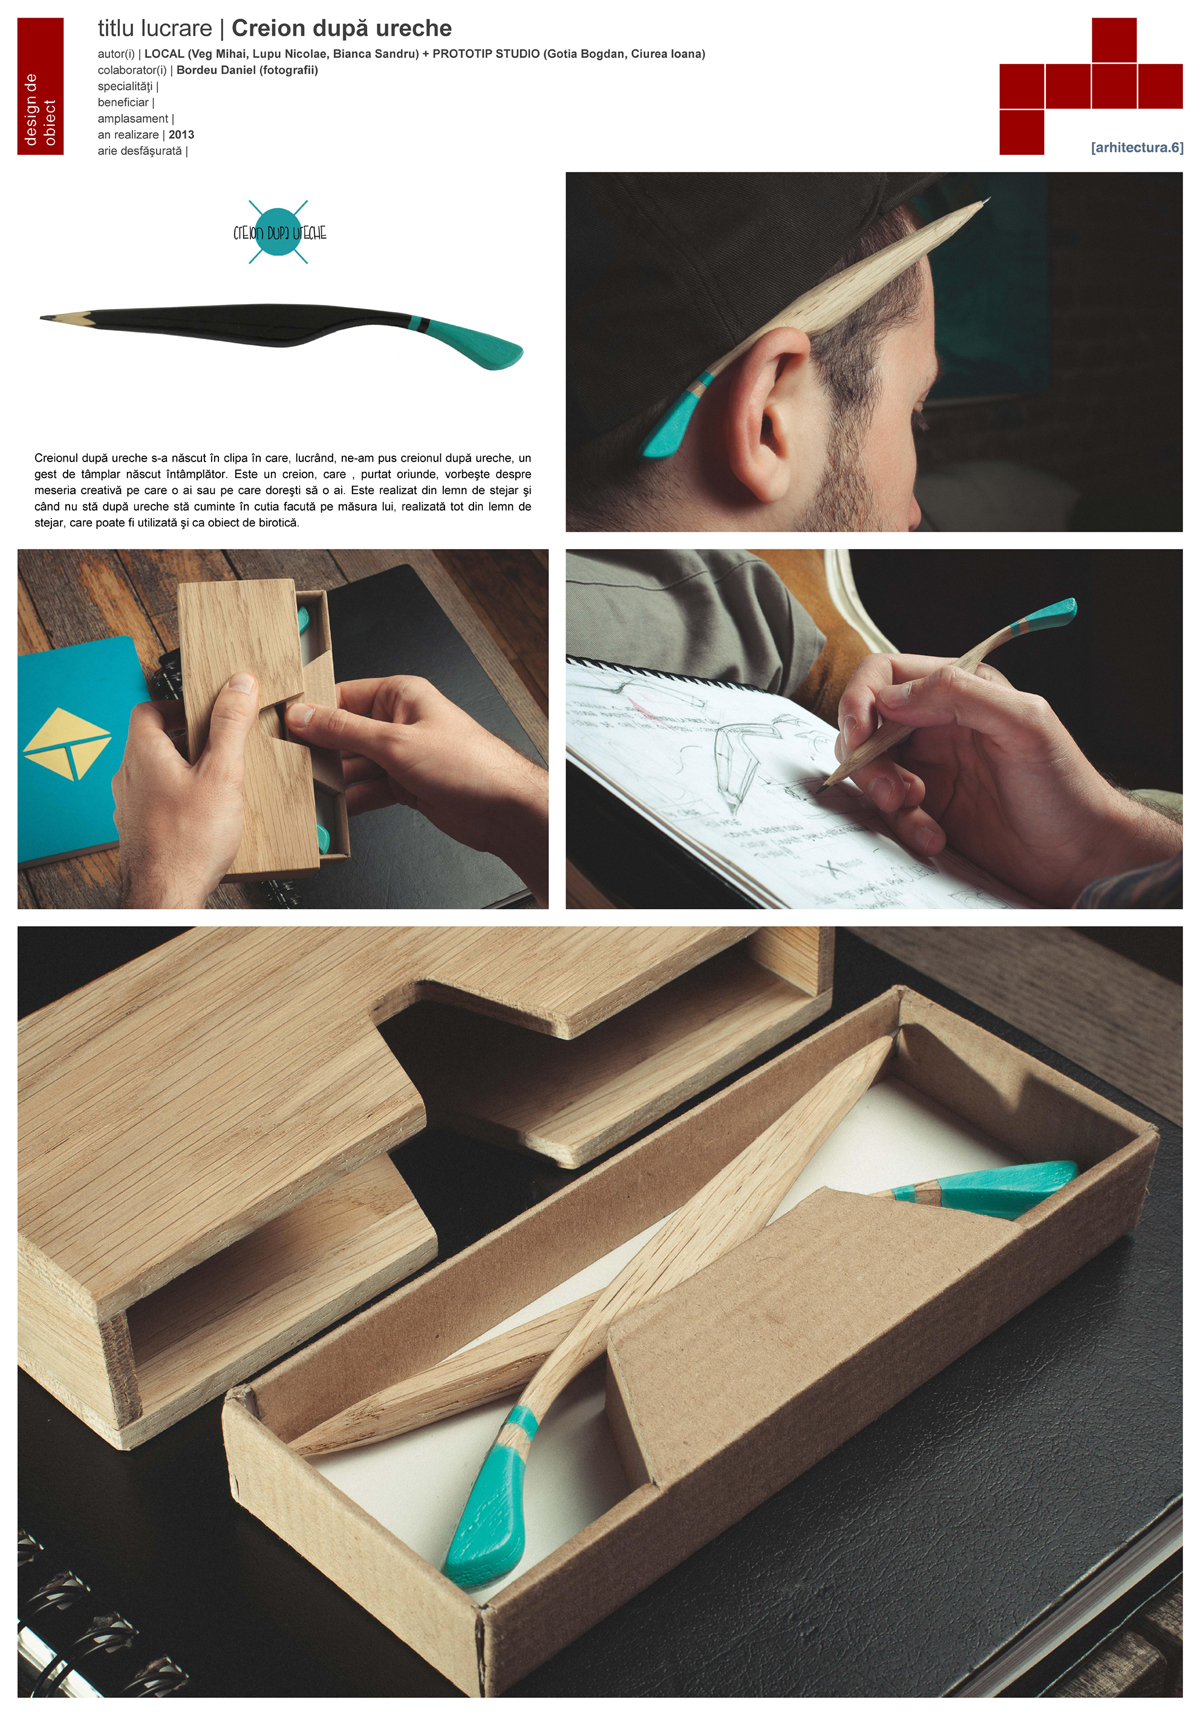 Local + Prototip Studio - Creion dupa ureche